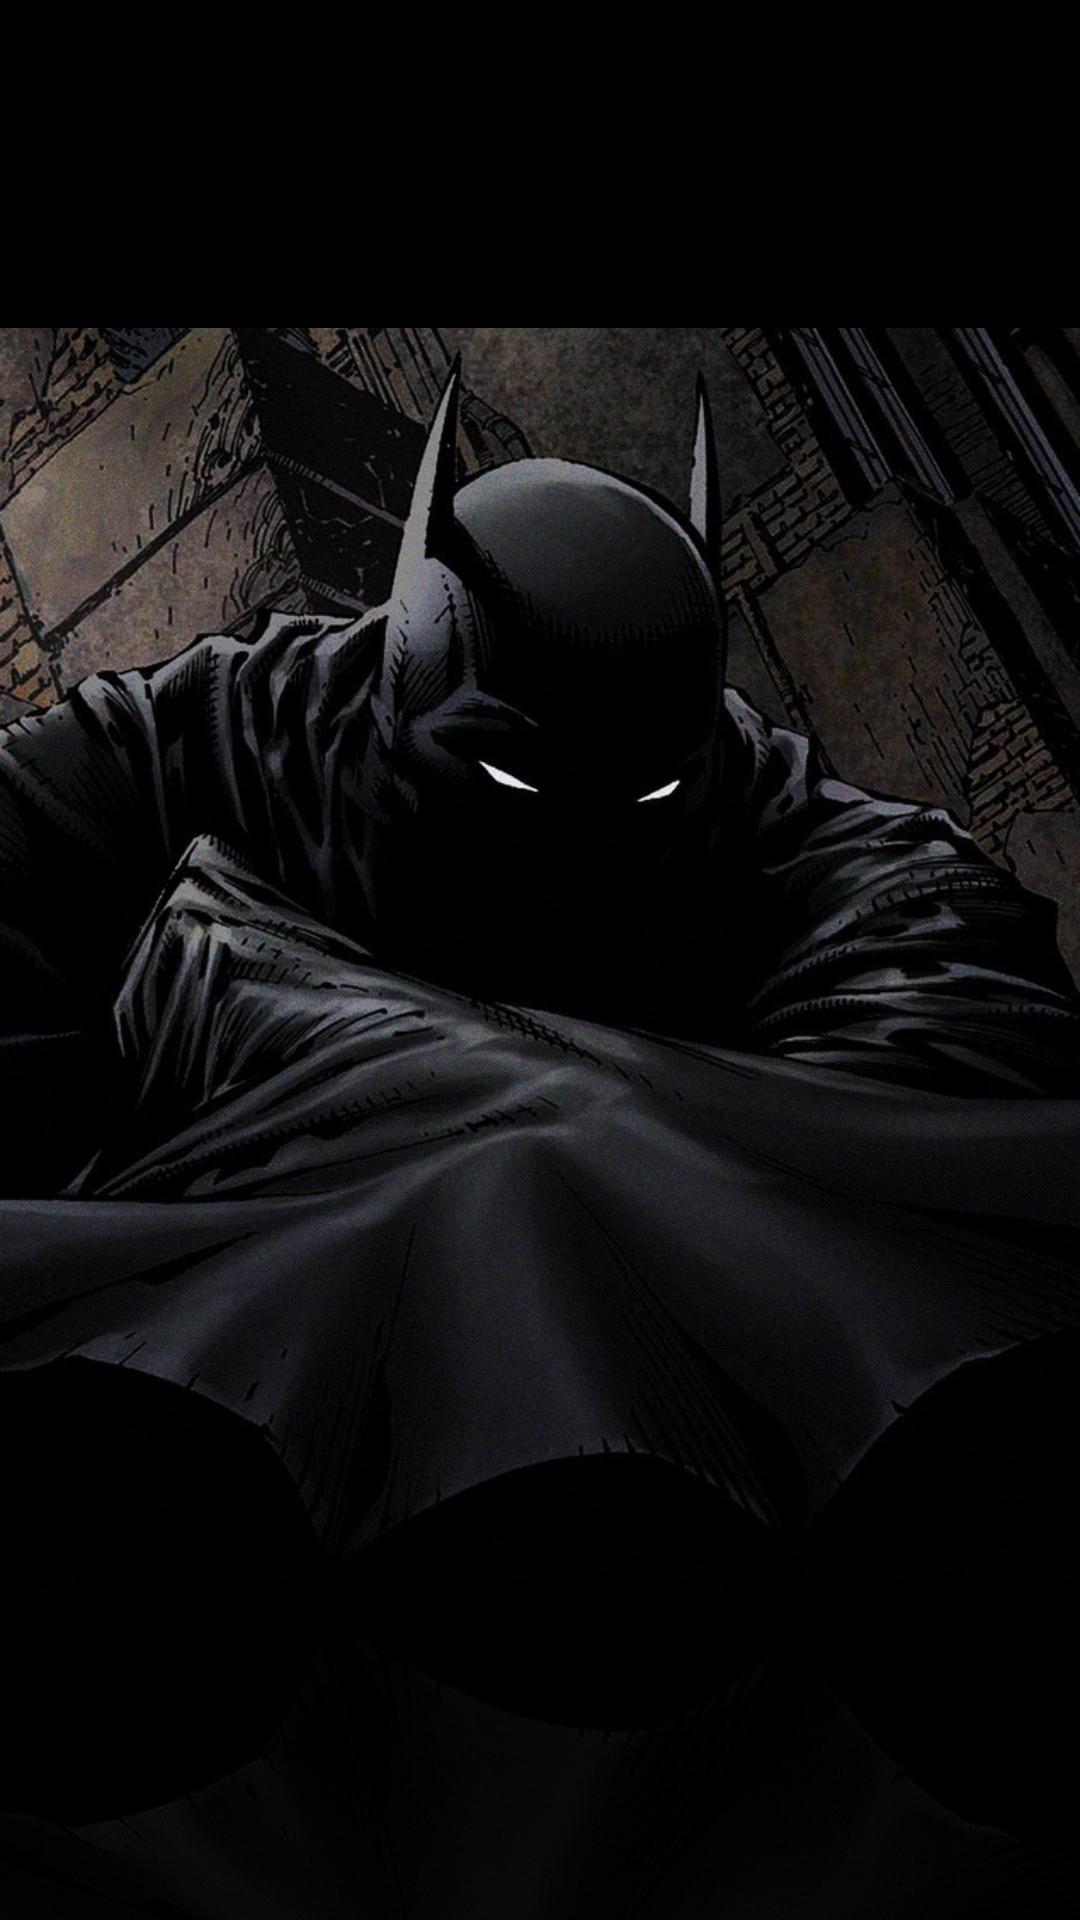 48+ Batman Wallpaper Android on WallpaperSafari